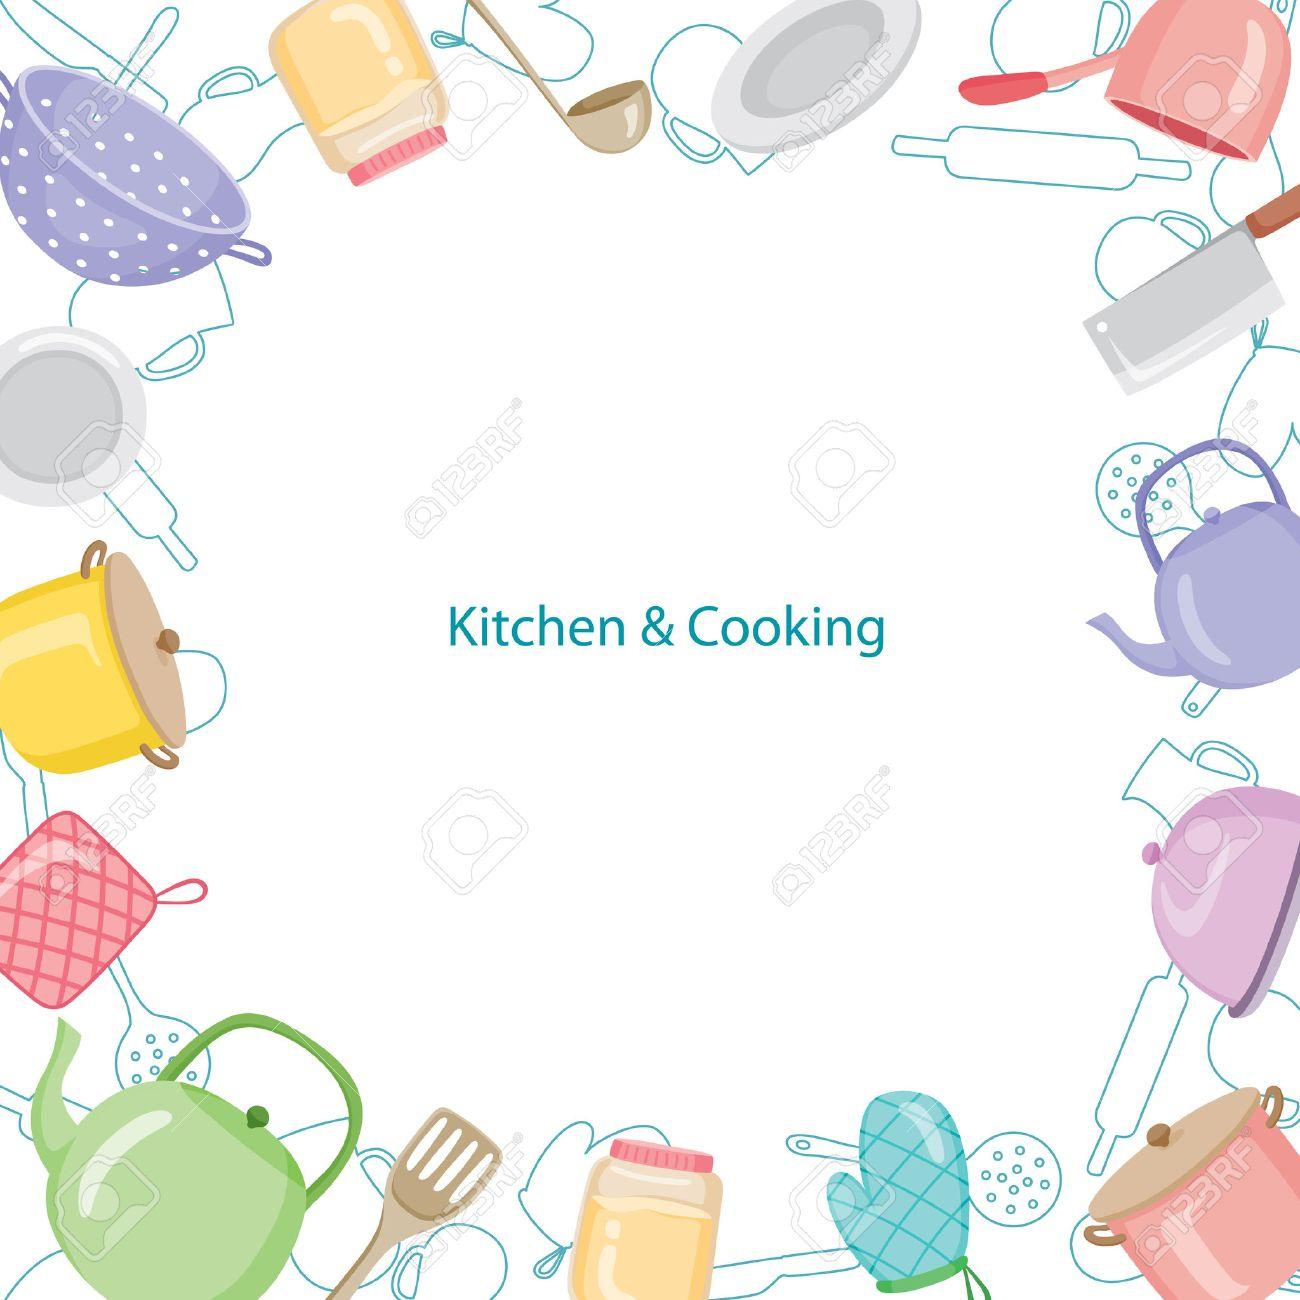 Kitchen Equipment Border, Kitchen, Kitchenware, Crockery, Cooking, Food, Bakery, Lifestyle - 54343671